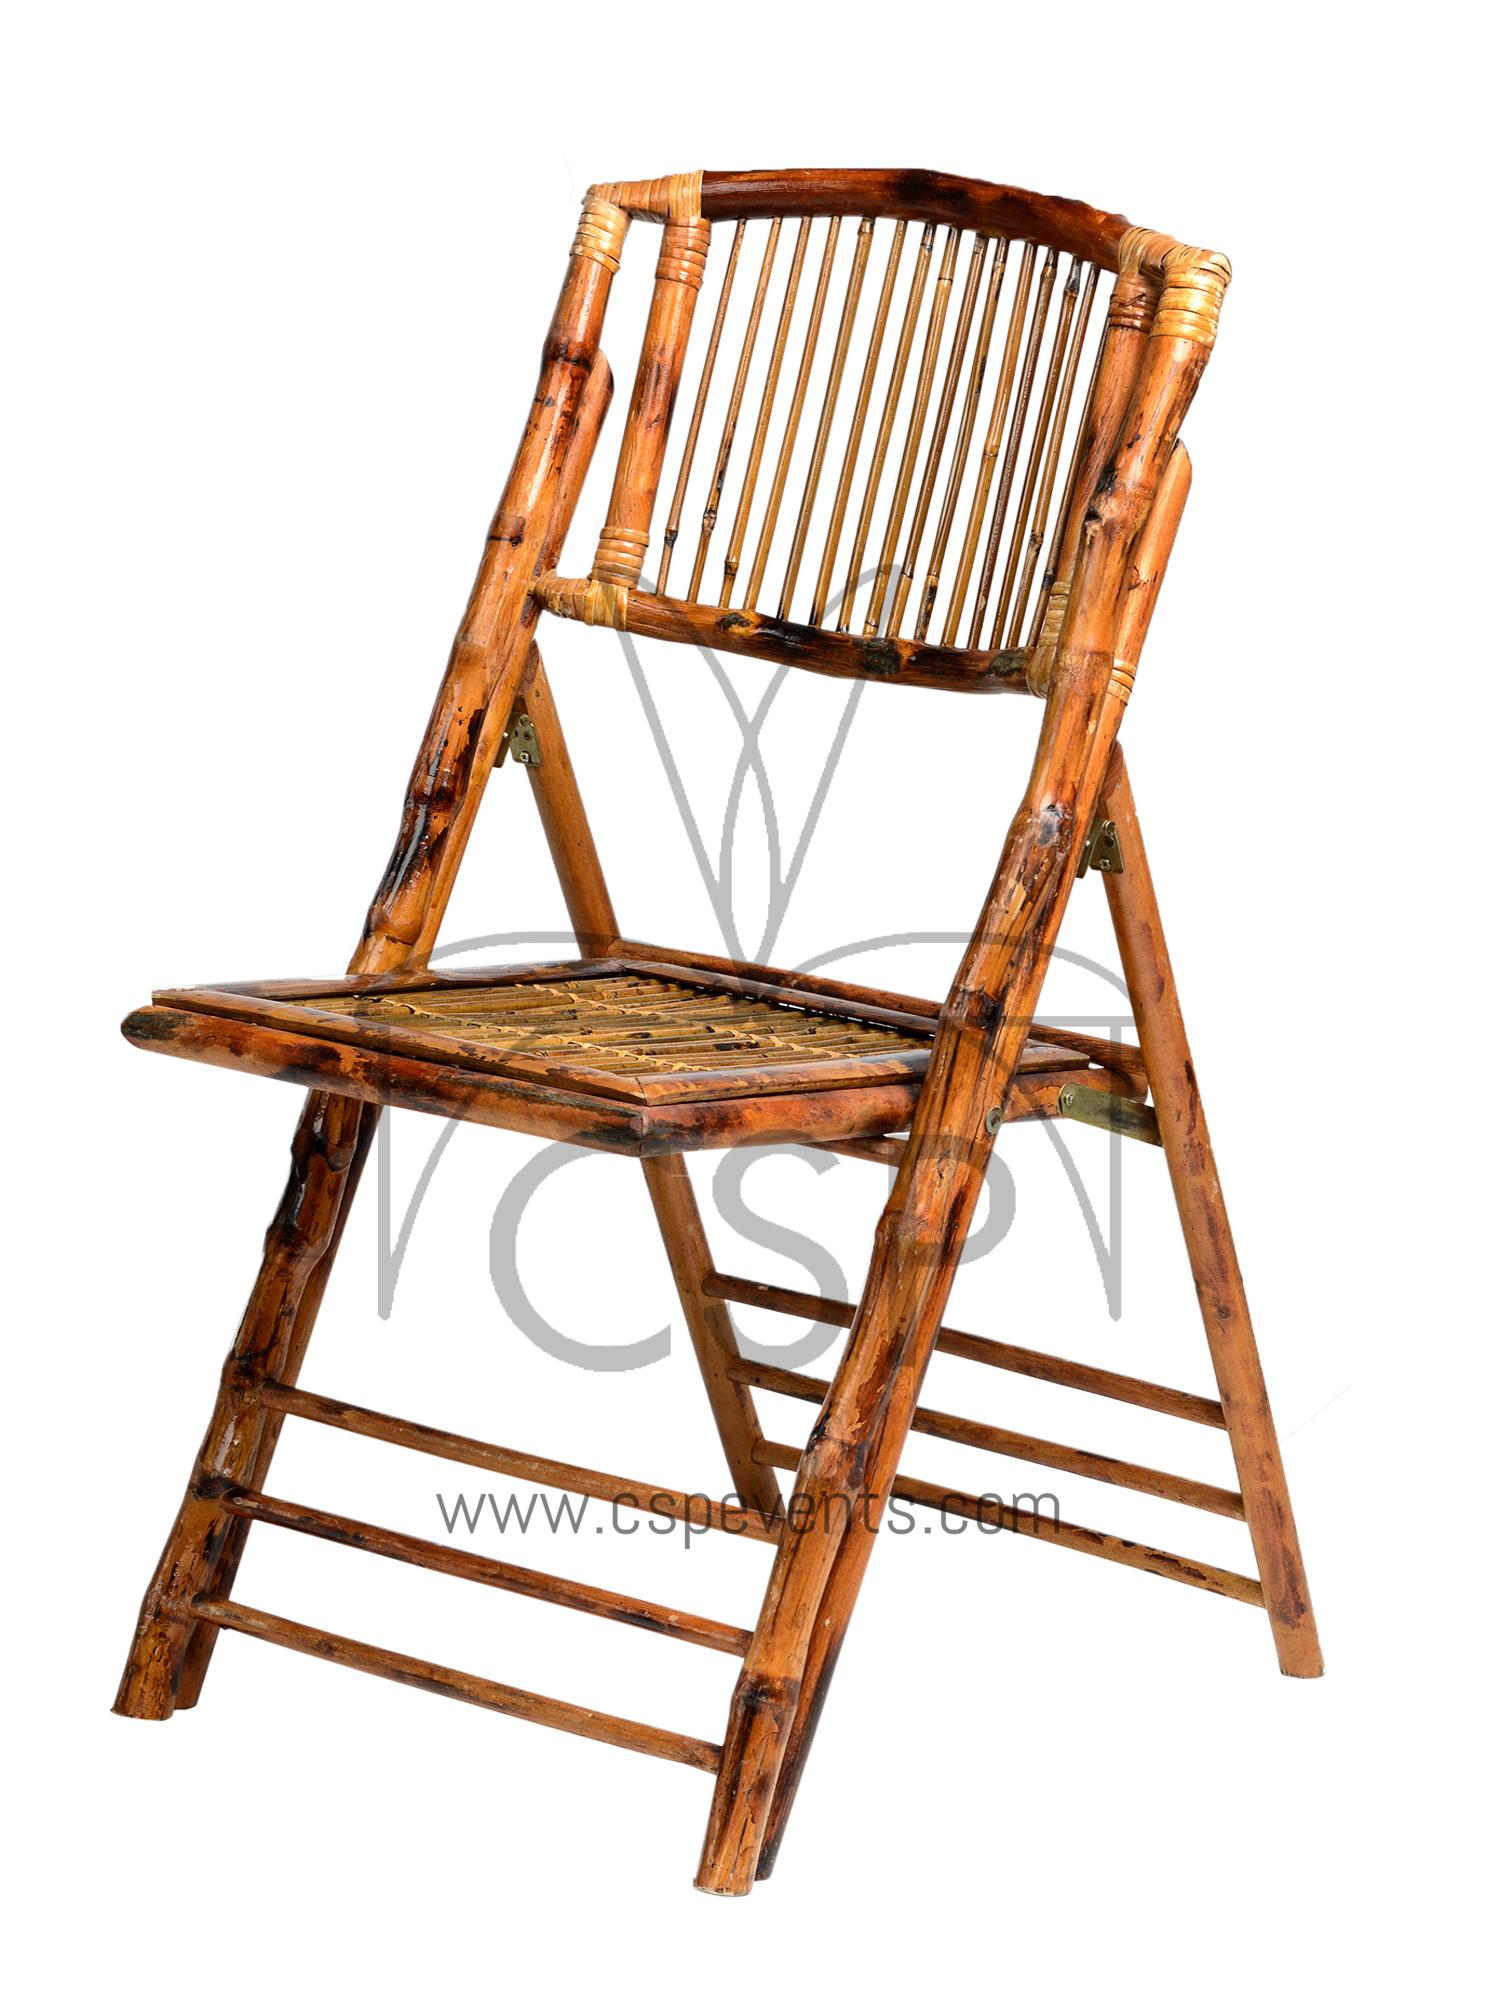 steel chair joints disney bean bag chairs princess bamboo folding  csp